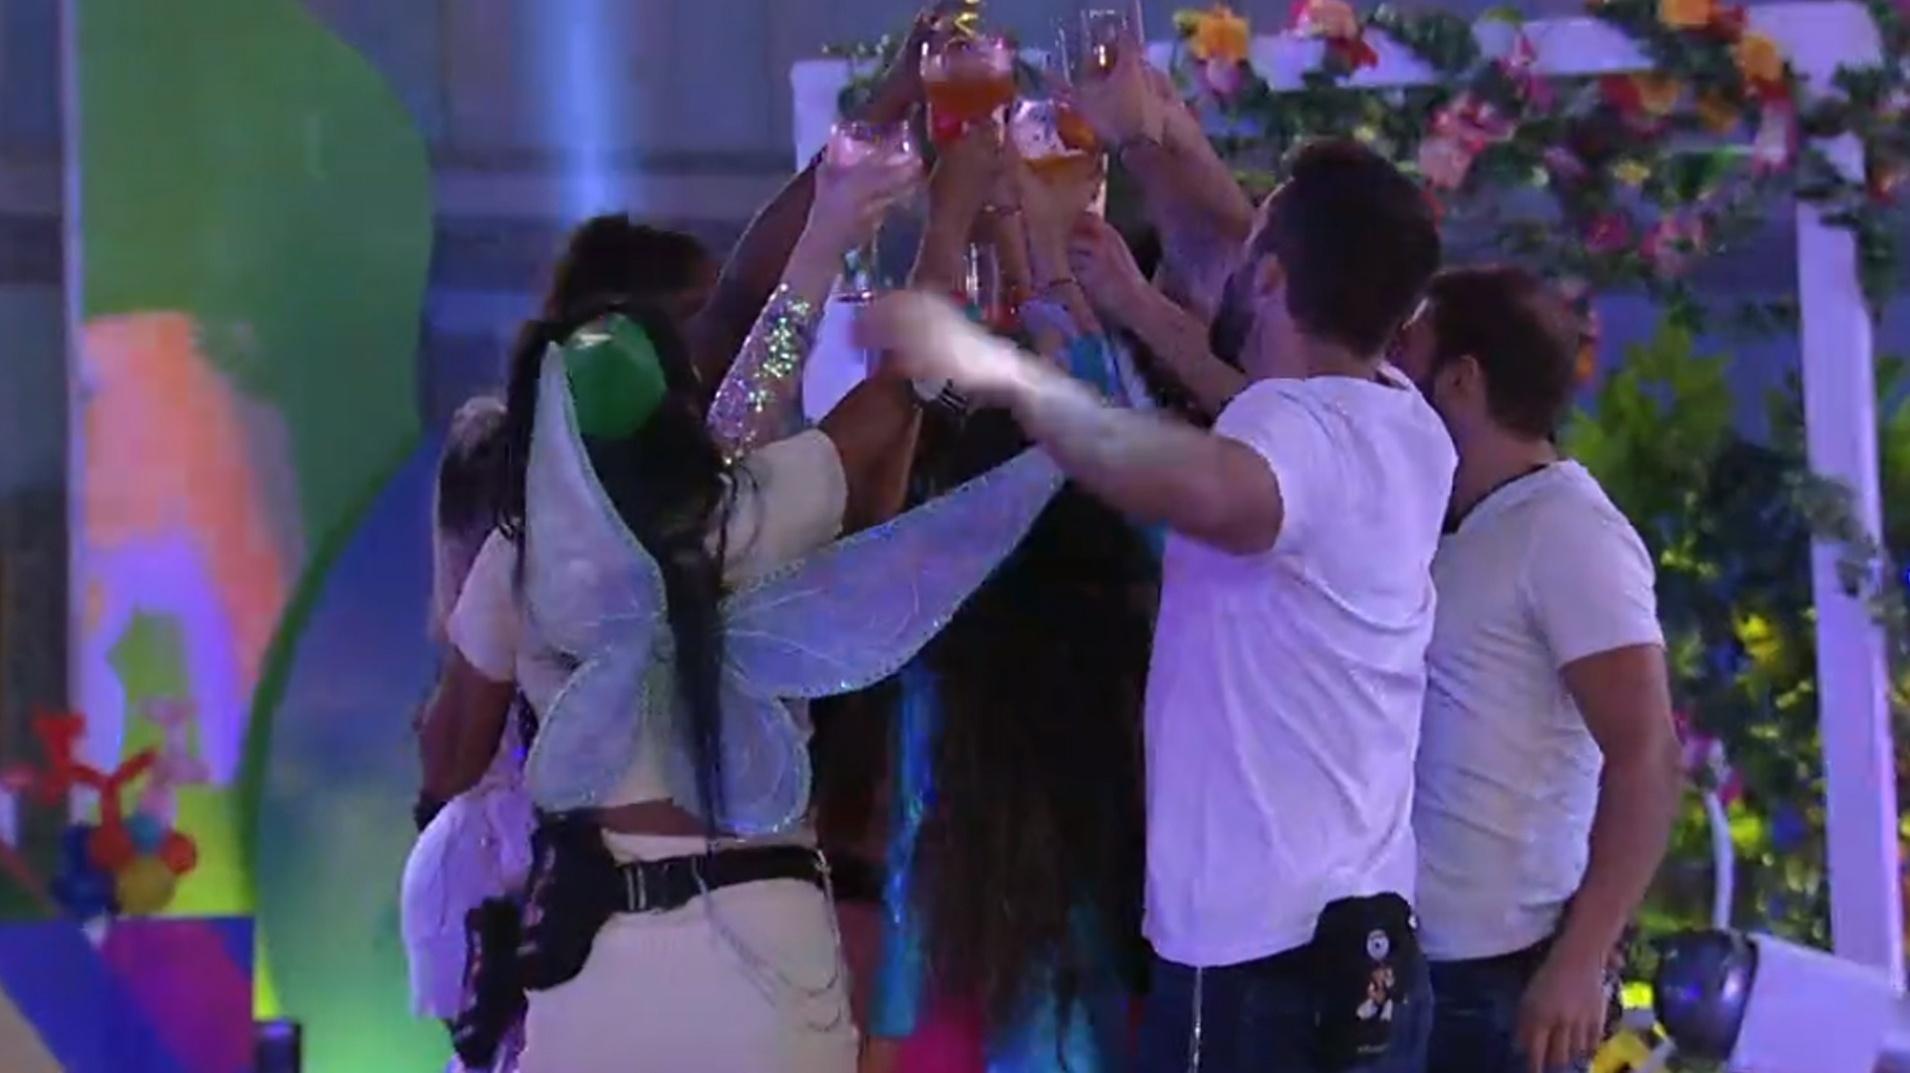 BBB 21: Brothers brindam durante festa - Reprodução/Globoplay